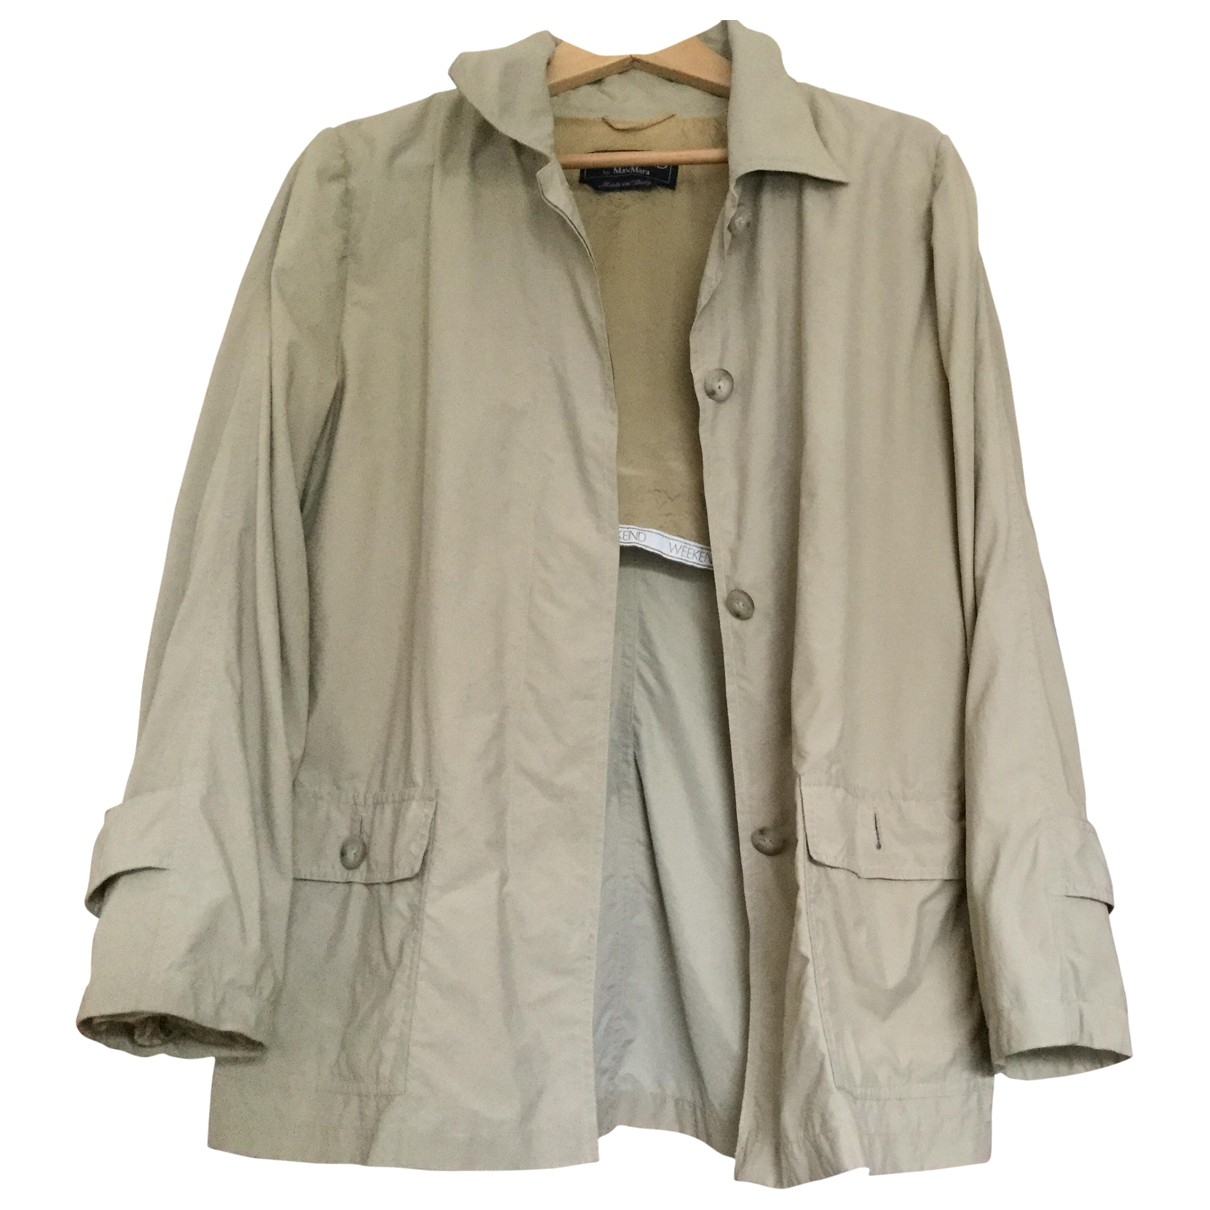 Max Mara Weekend \N Ecru jacket for Women 44 IT